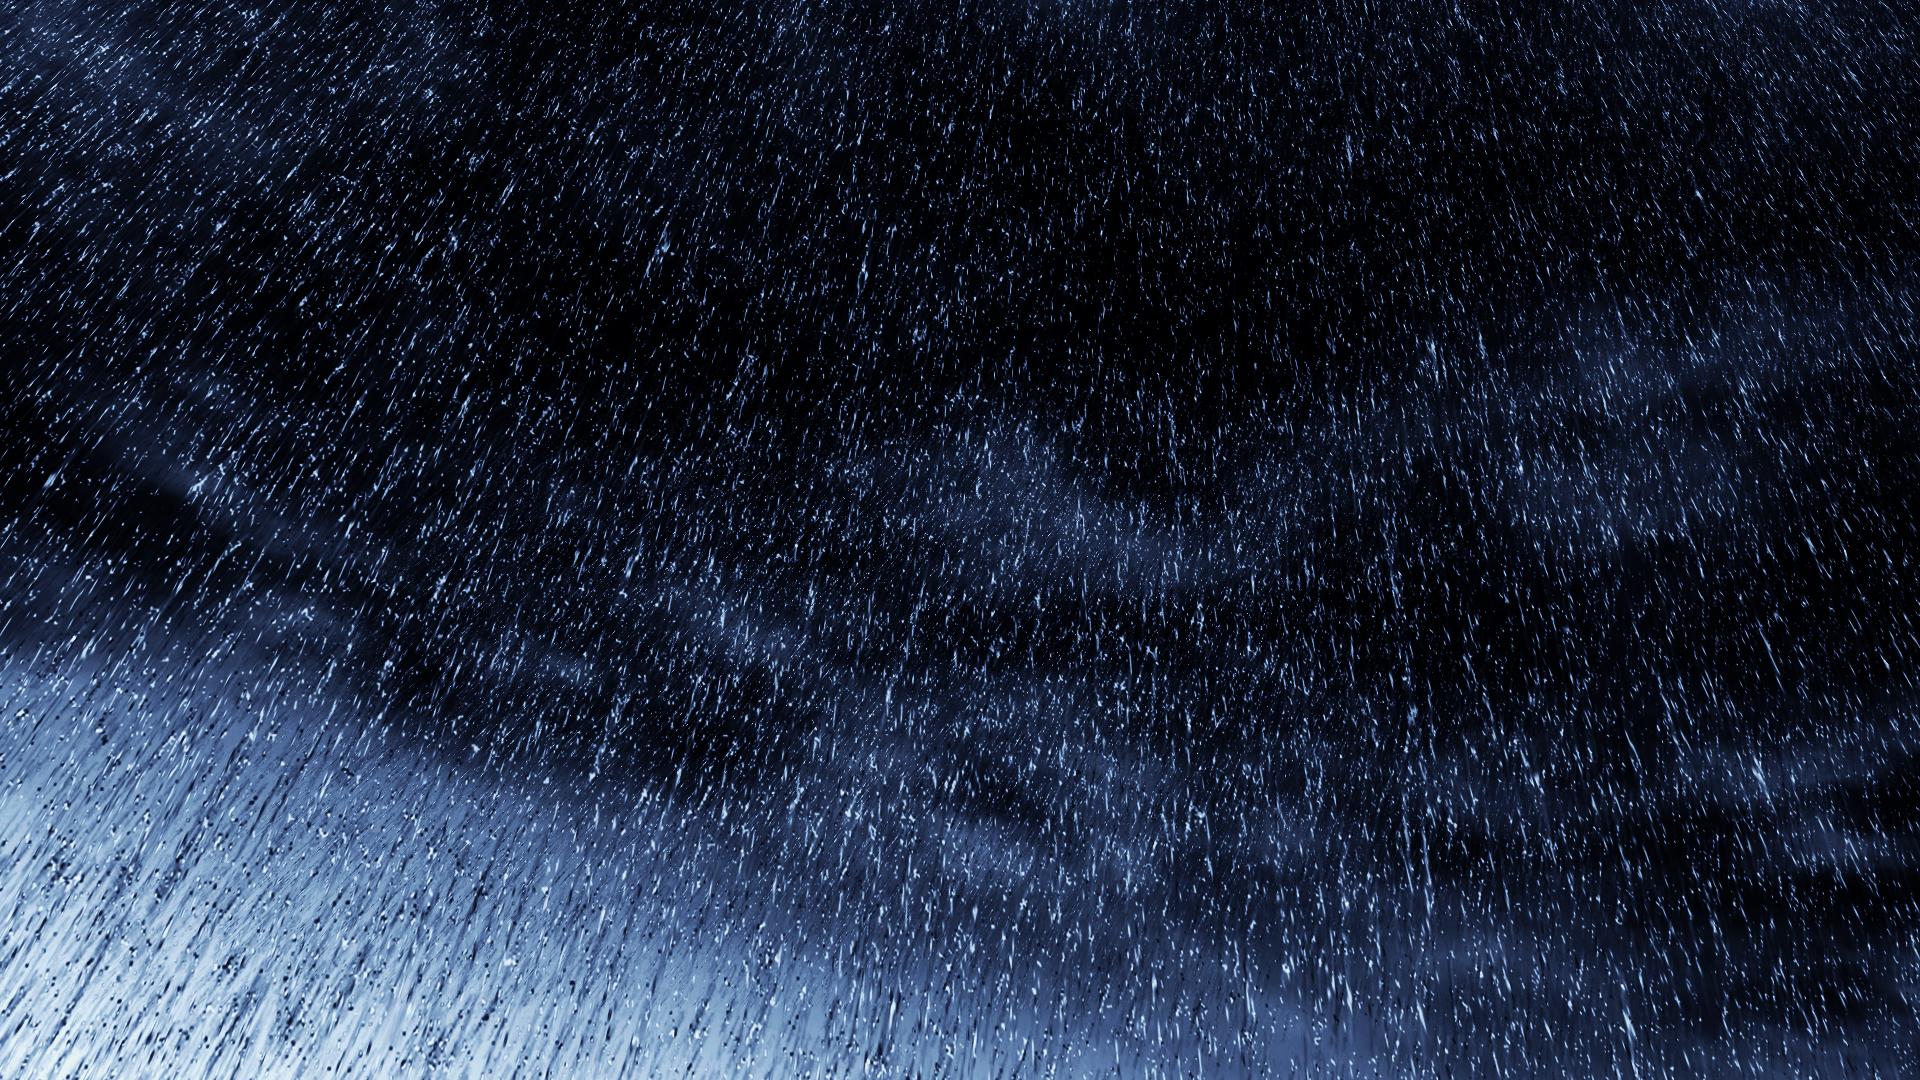 Rain Wallpaper 1920X1080 wallpaper   694762 1920x1080